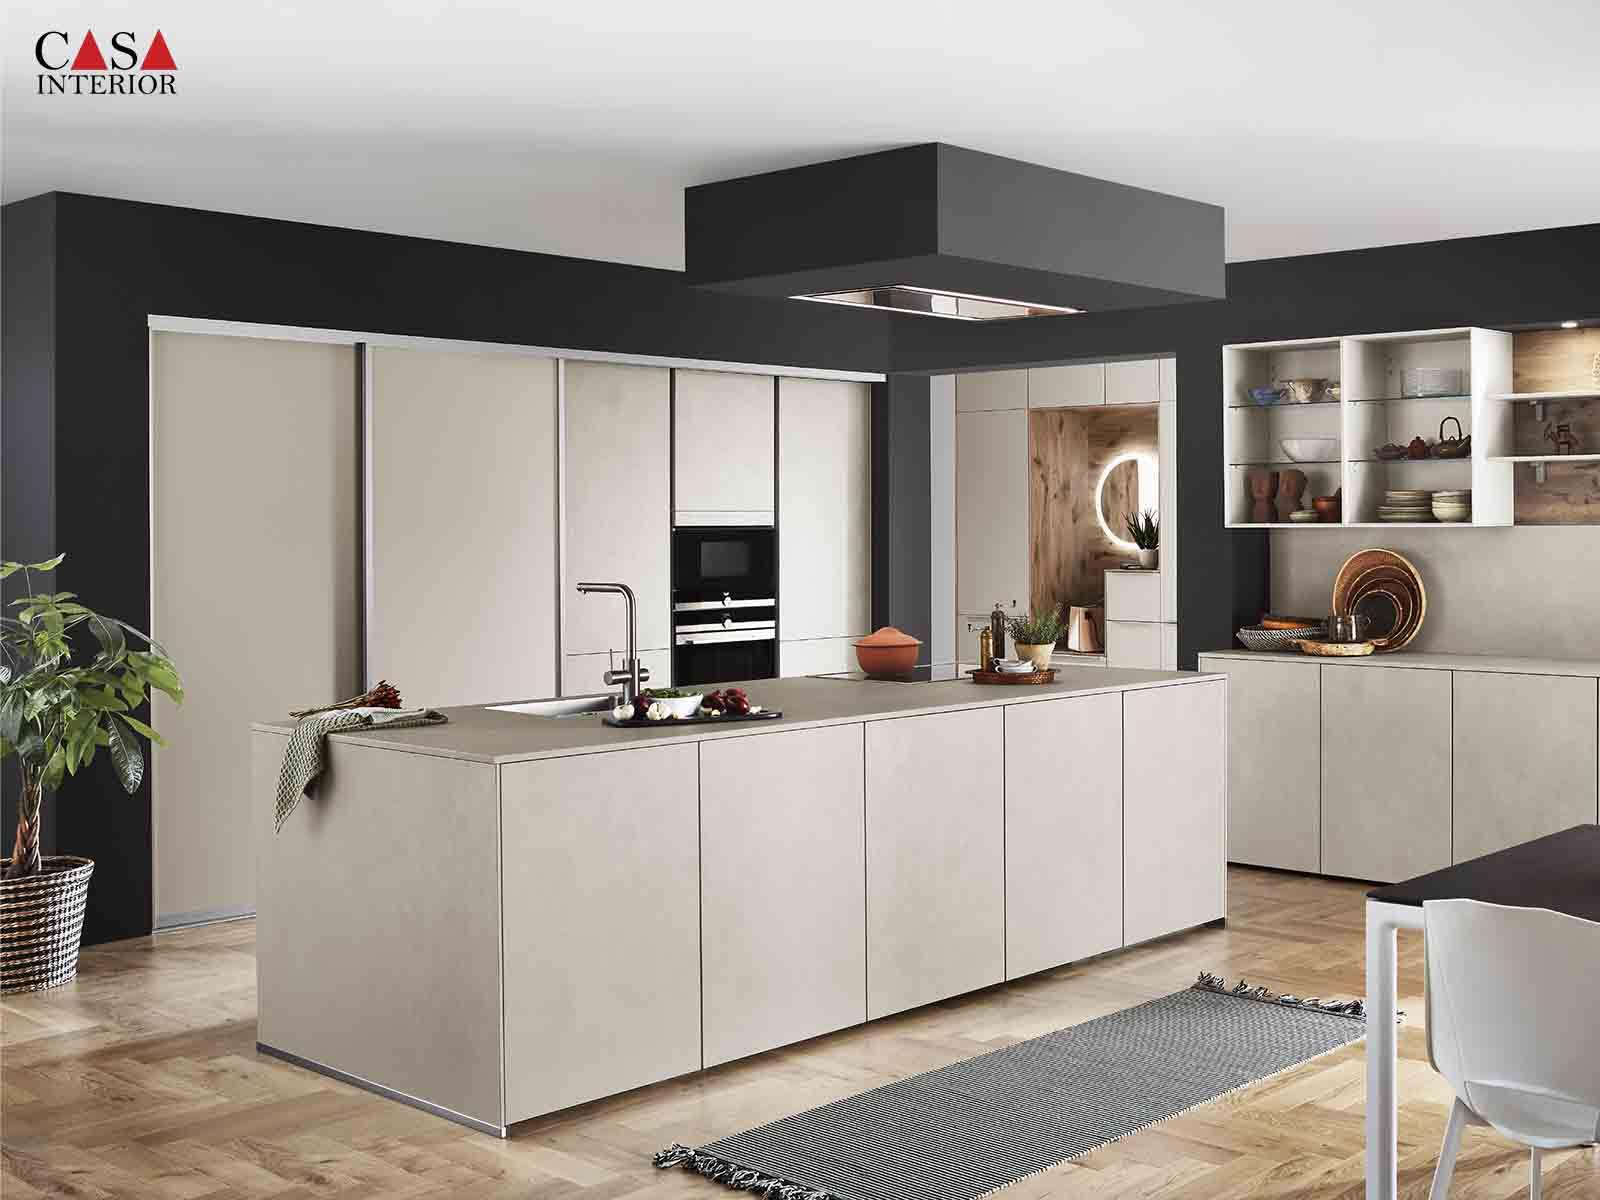 Küchentime Riva 842 Line N